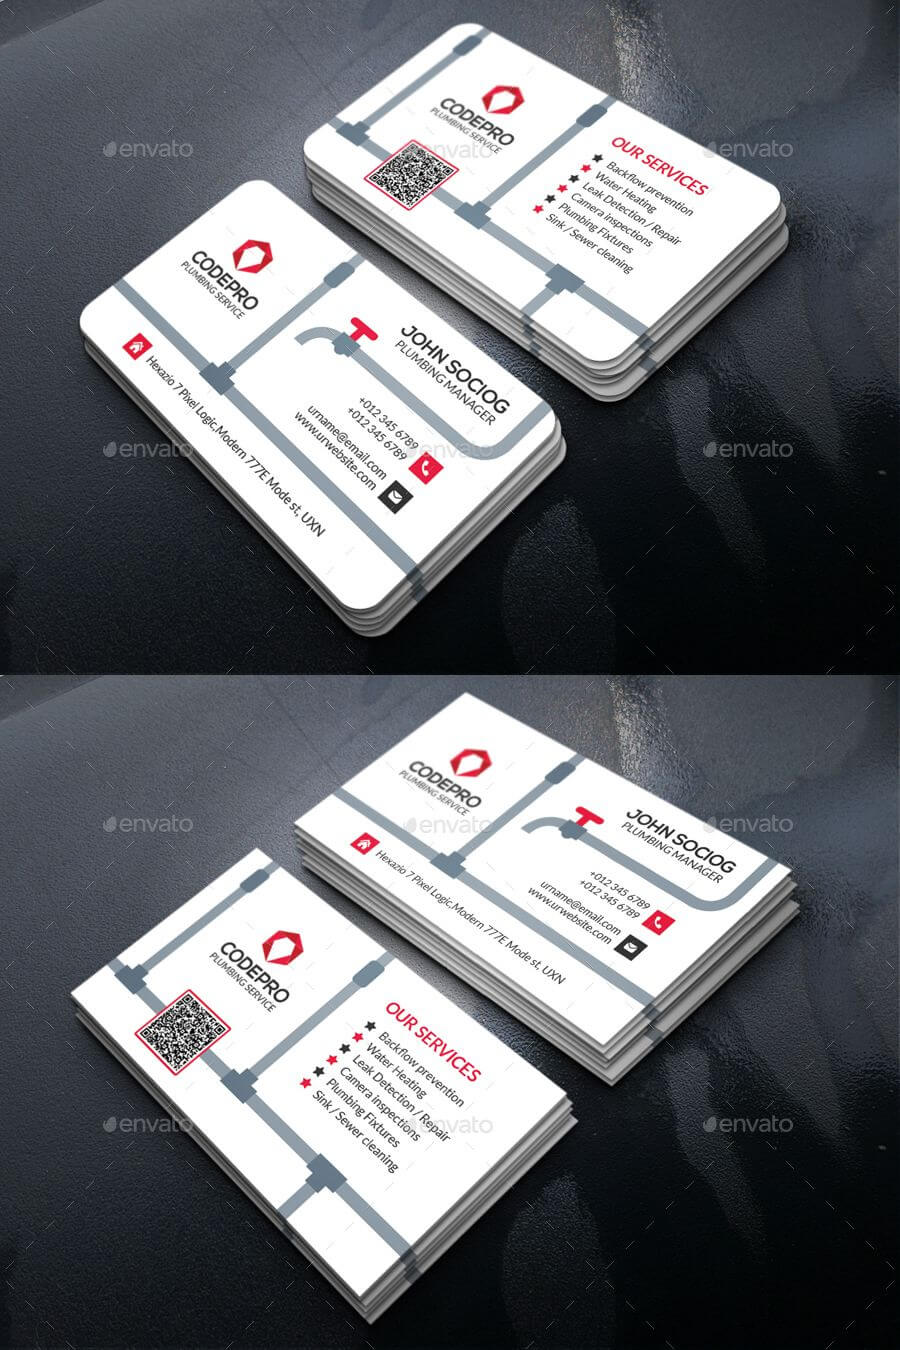 Plumbing Business Card Template Psd | Make Business Cards In Business Card Maker Template